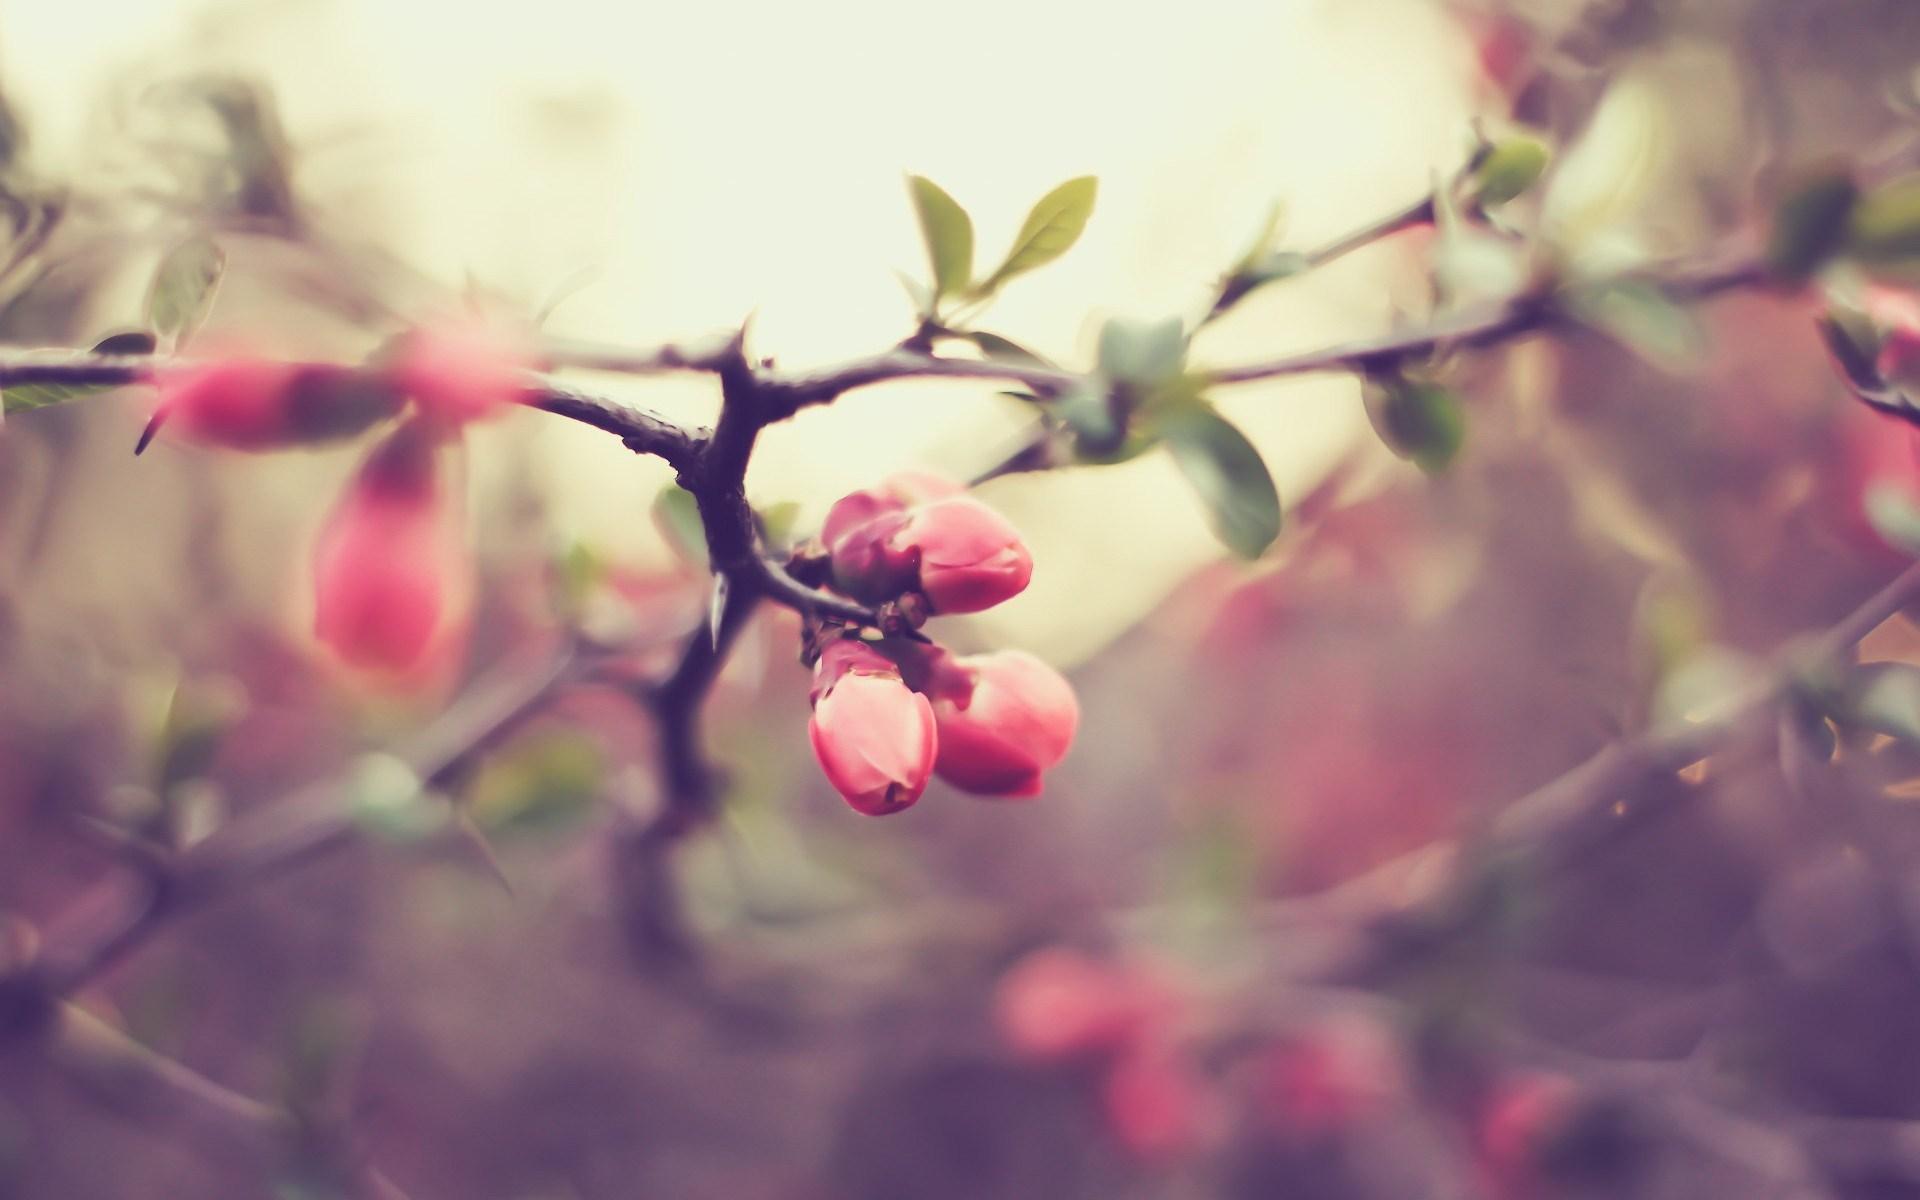 Branch Pink Flowers Nature Macro HD Wallpaper